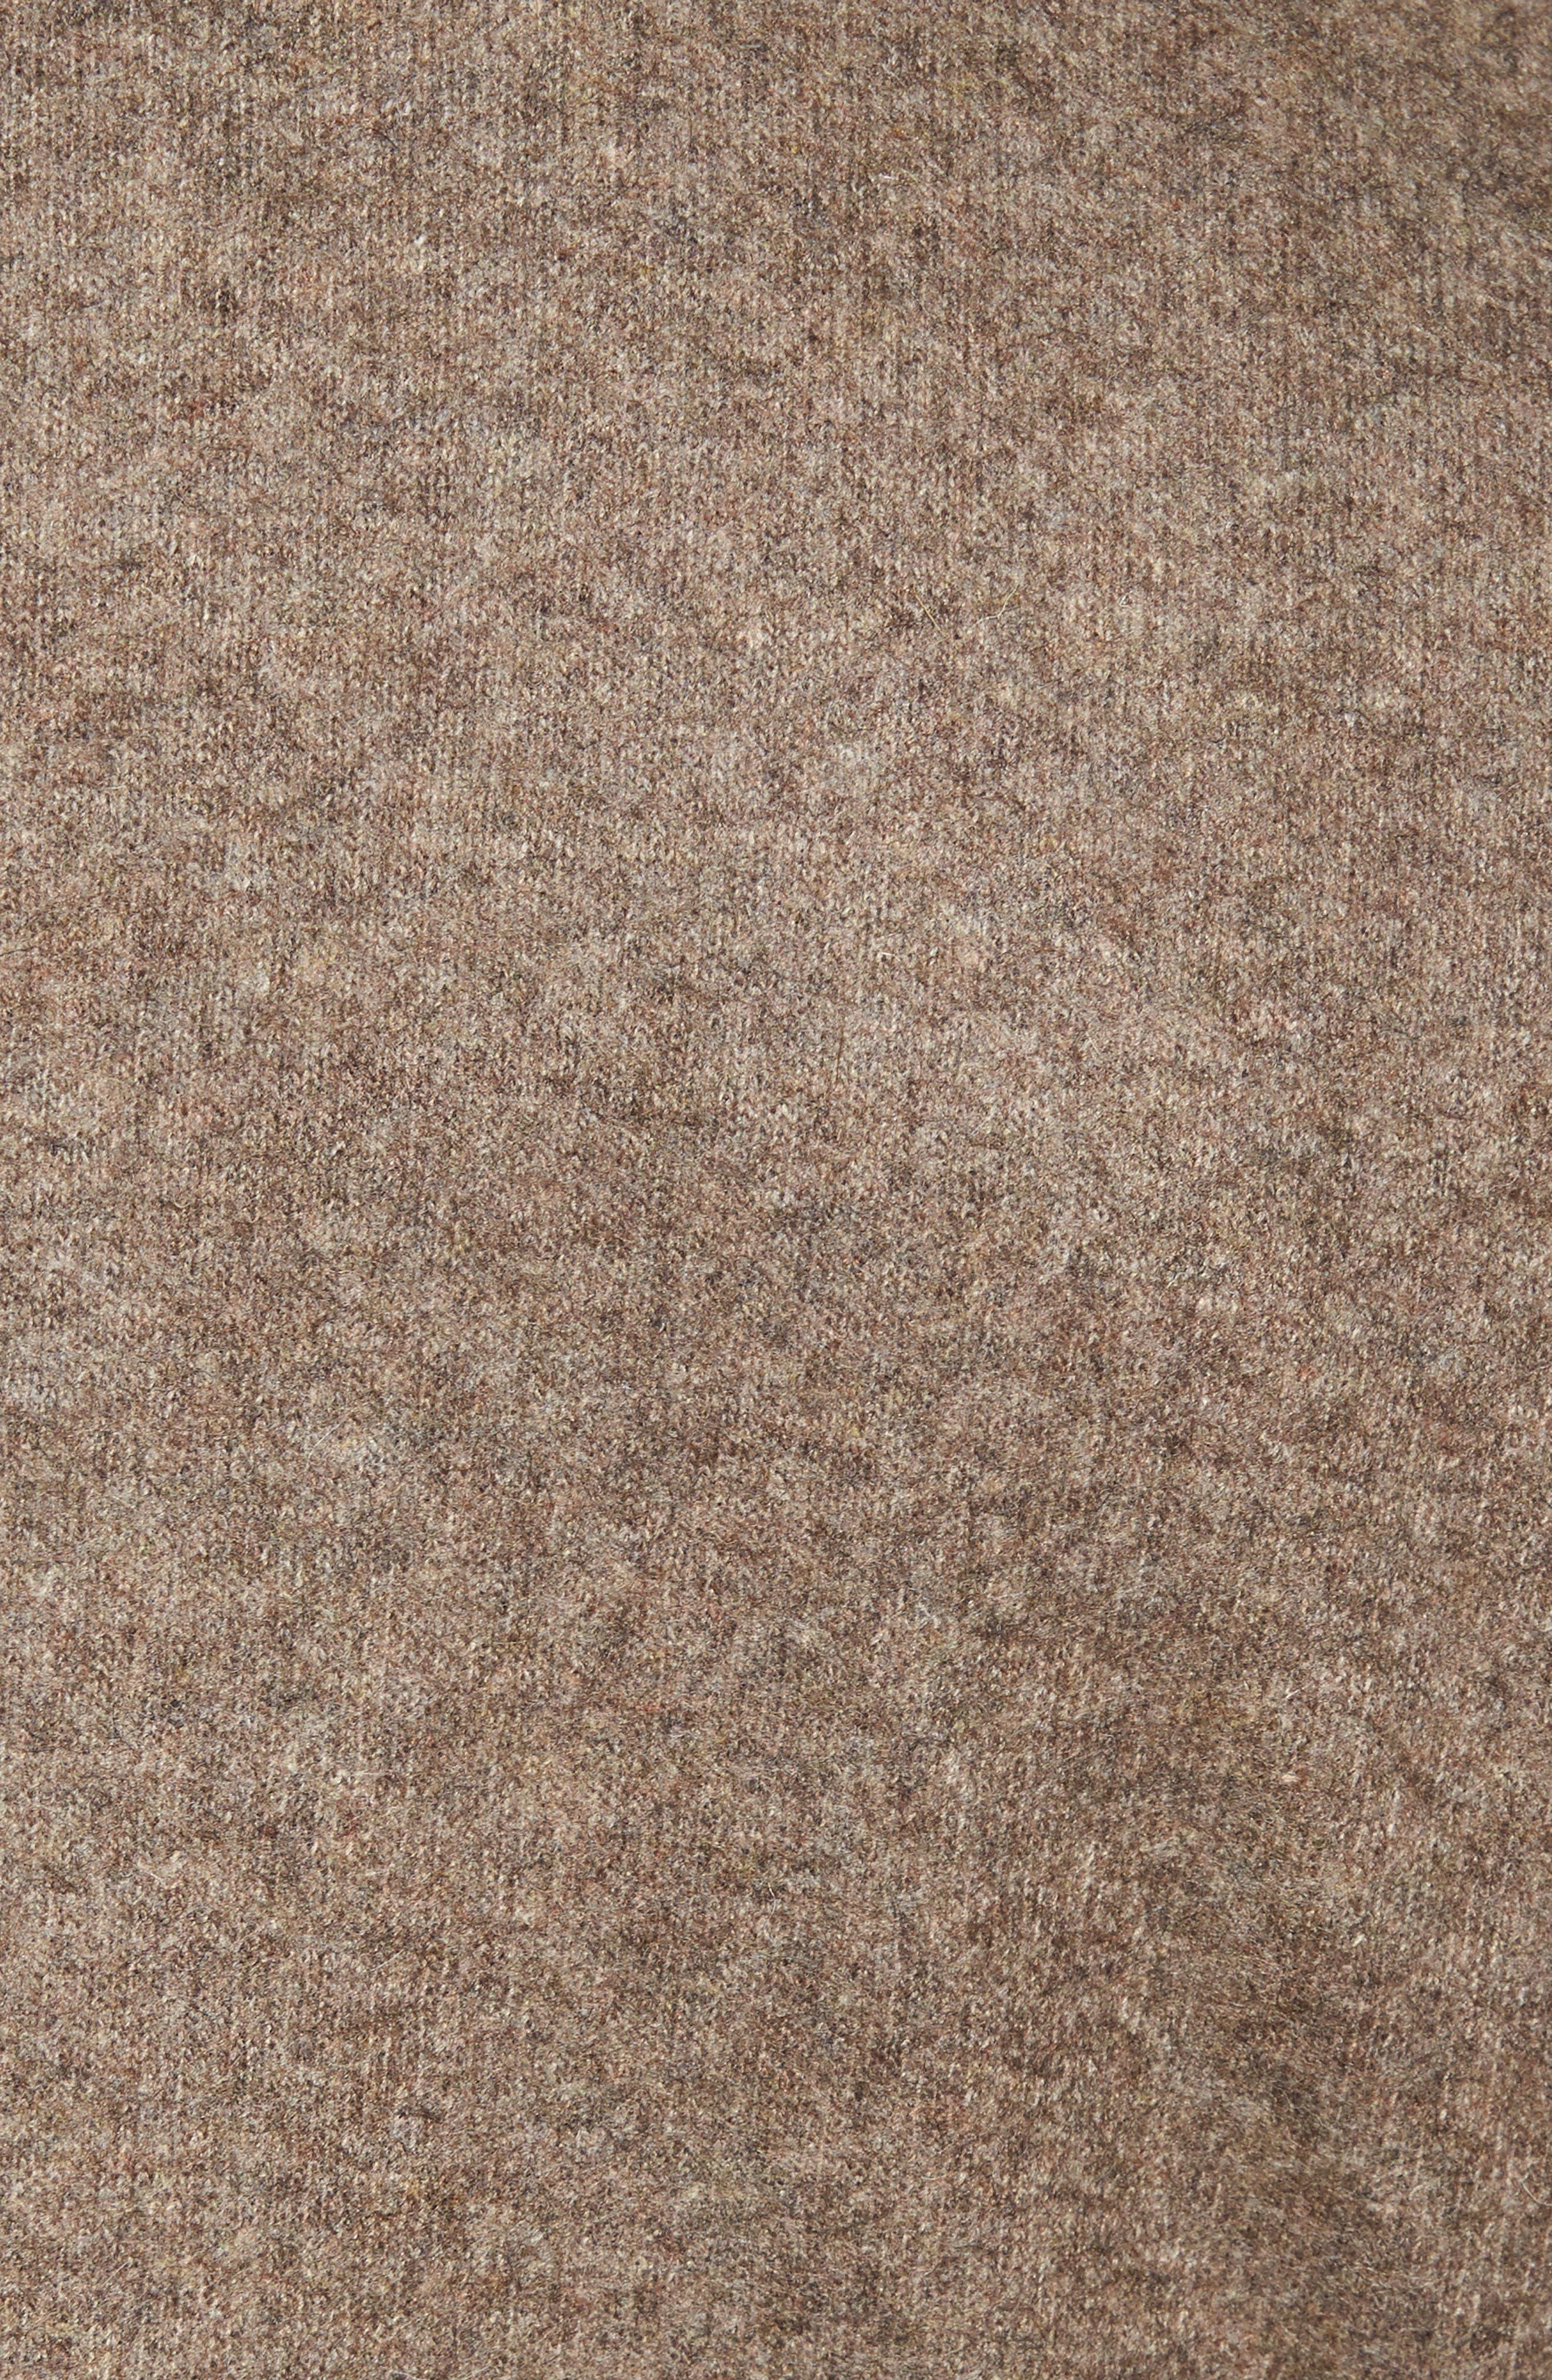 Dylan Knit Wool Blend Sport Coat,                             Alternate thumbnail 6, color,                             269